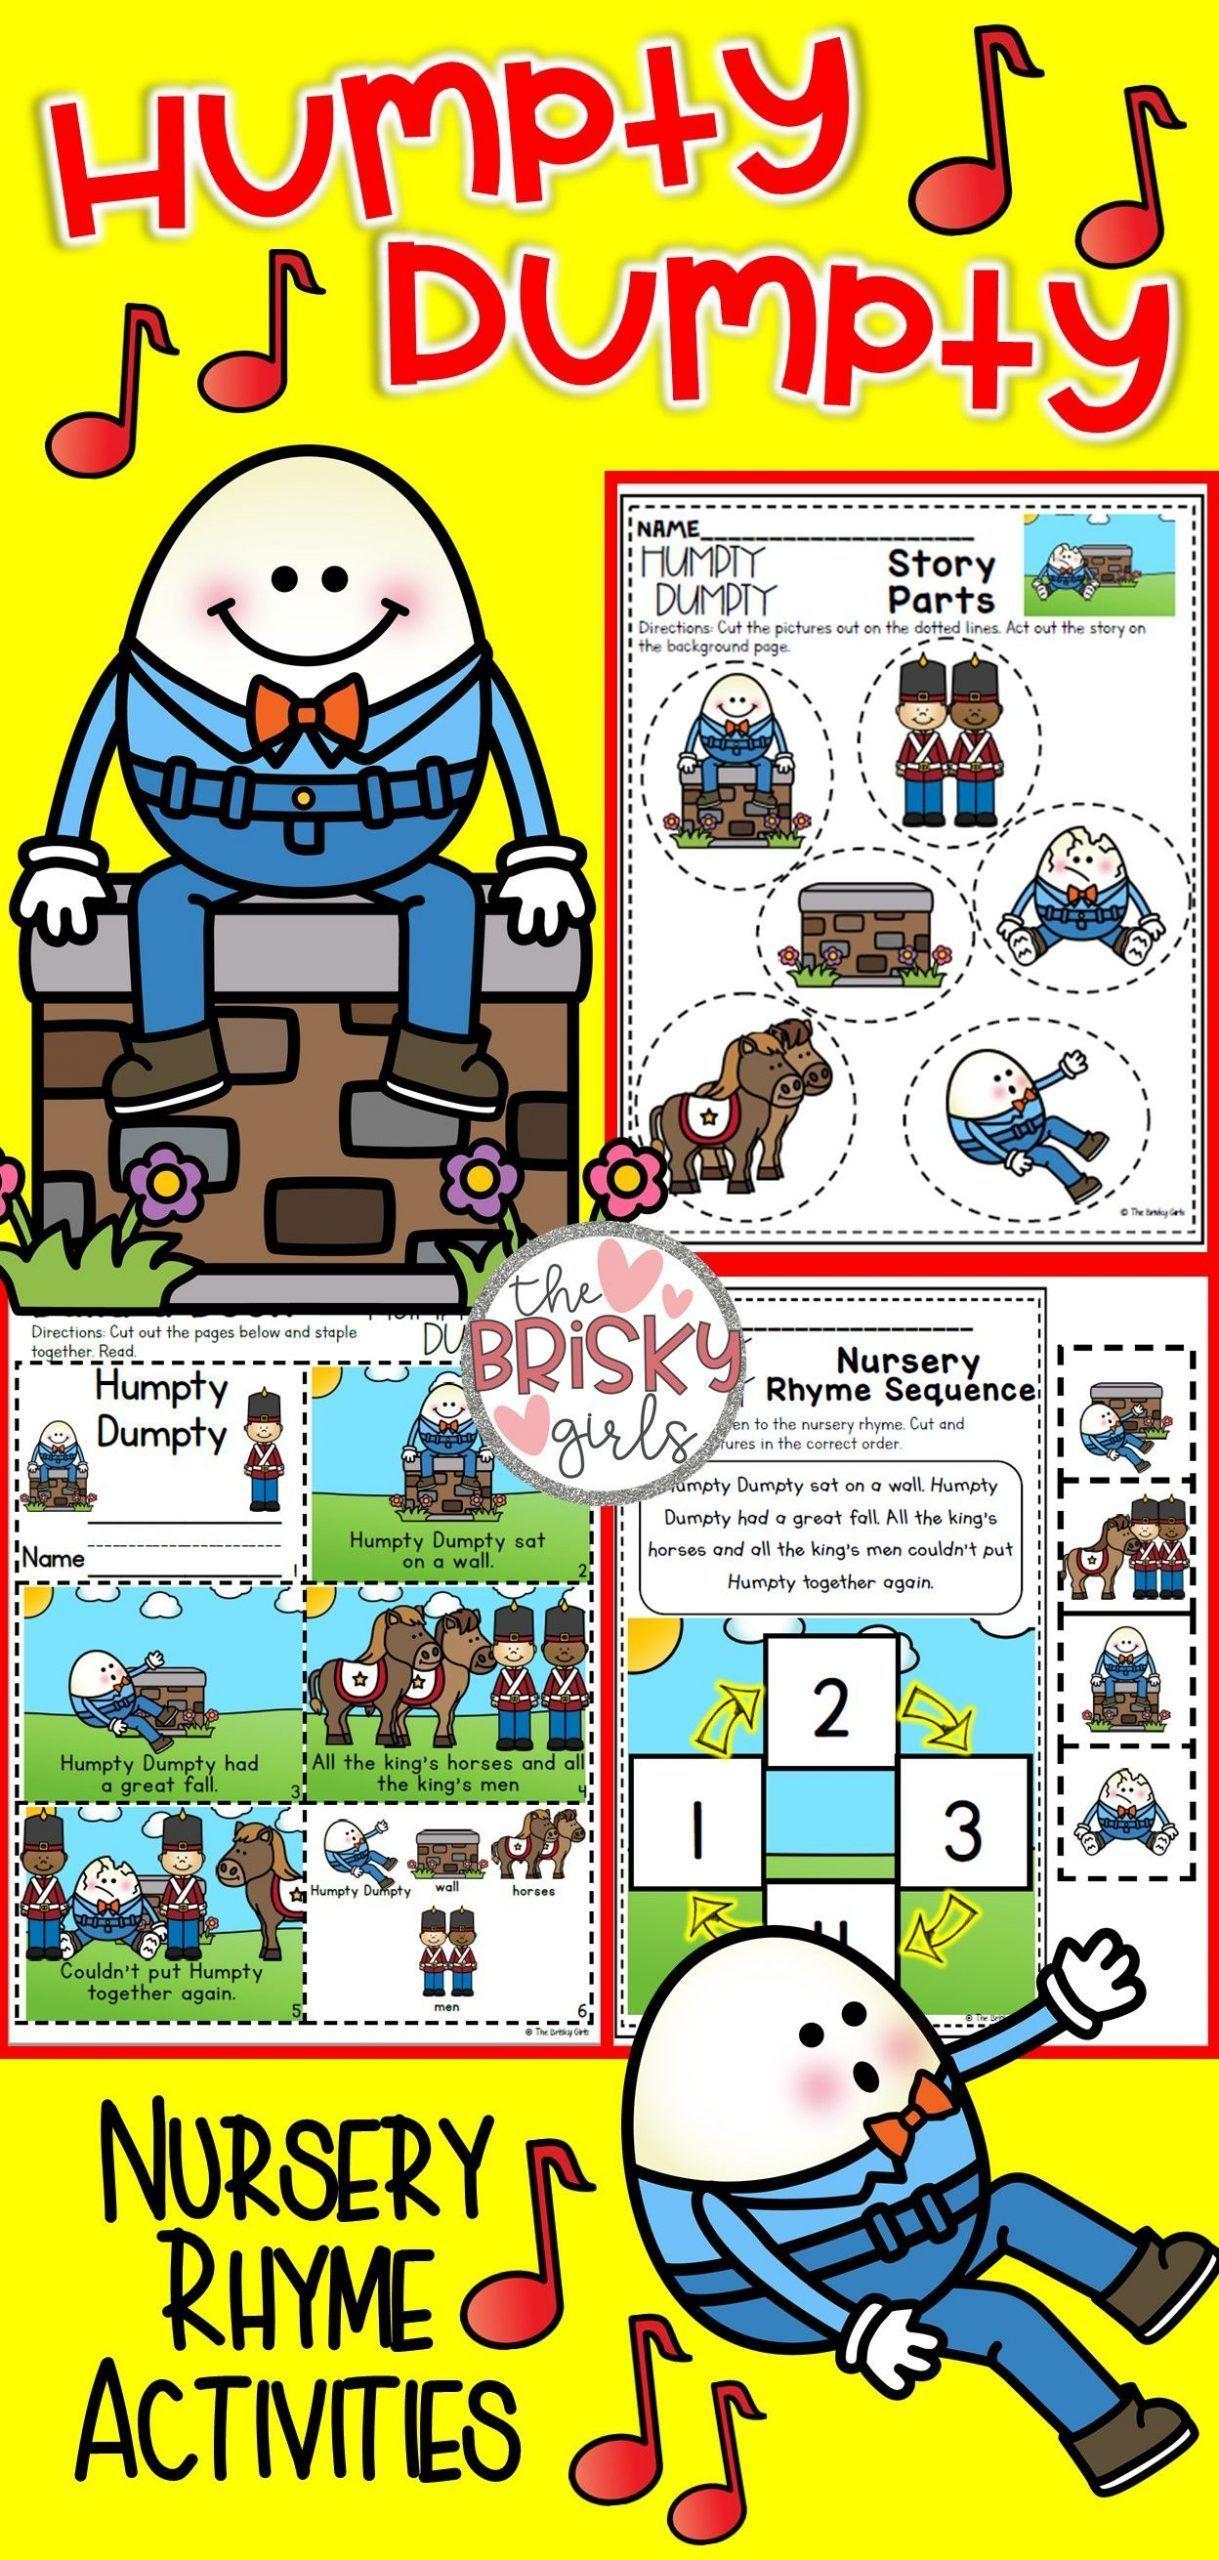 Nursery Rhymes Preschool Humpty Dumpty Nursery Rhyme